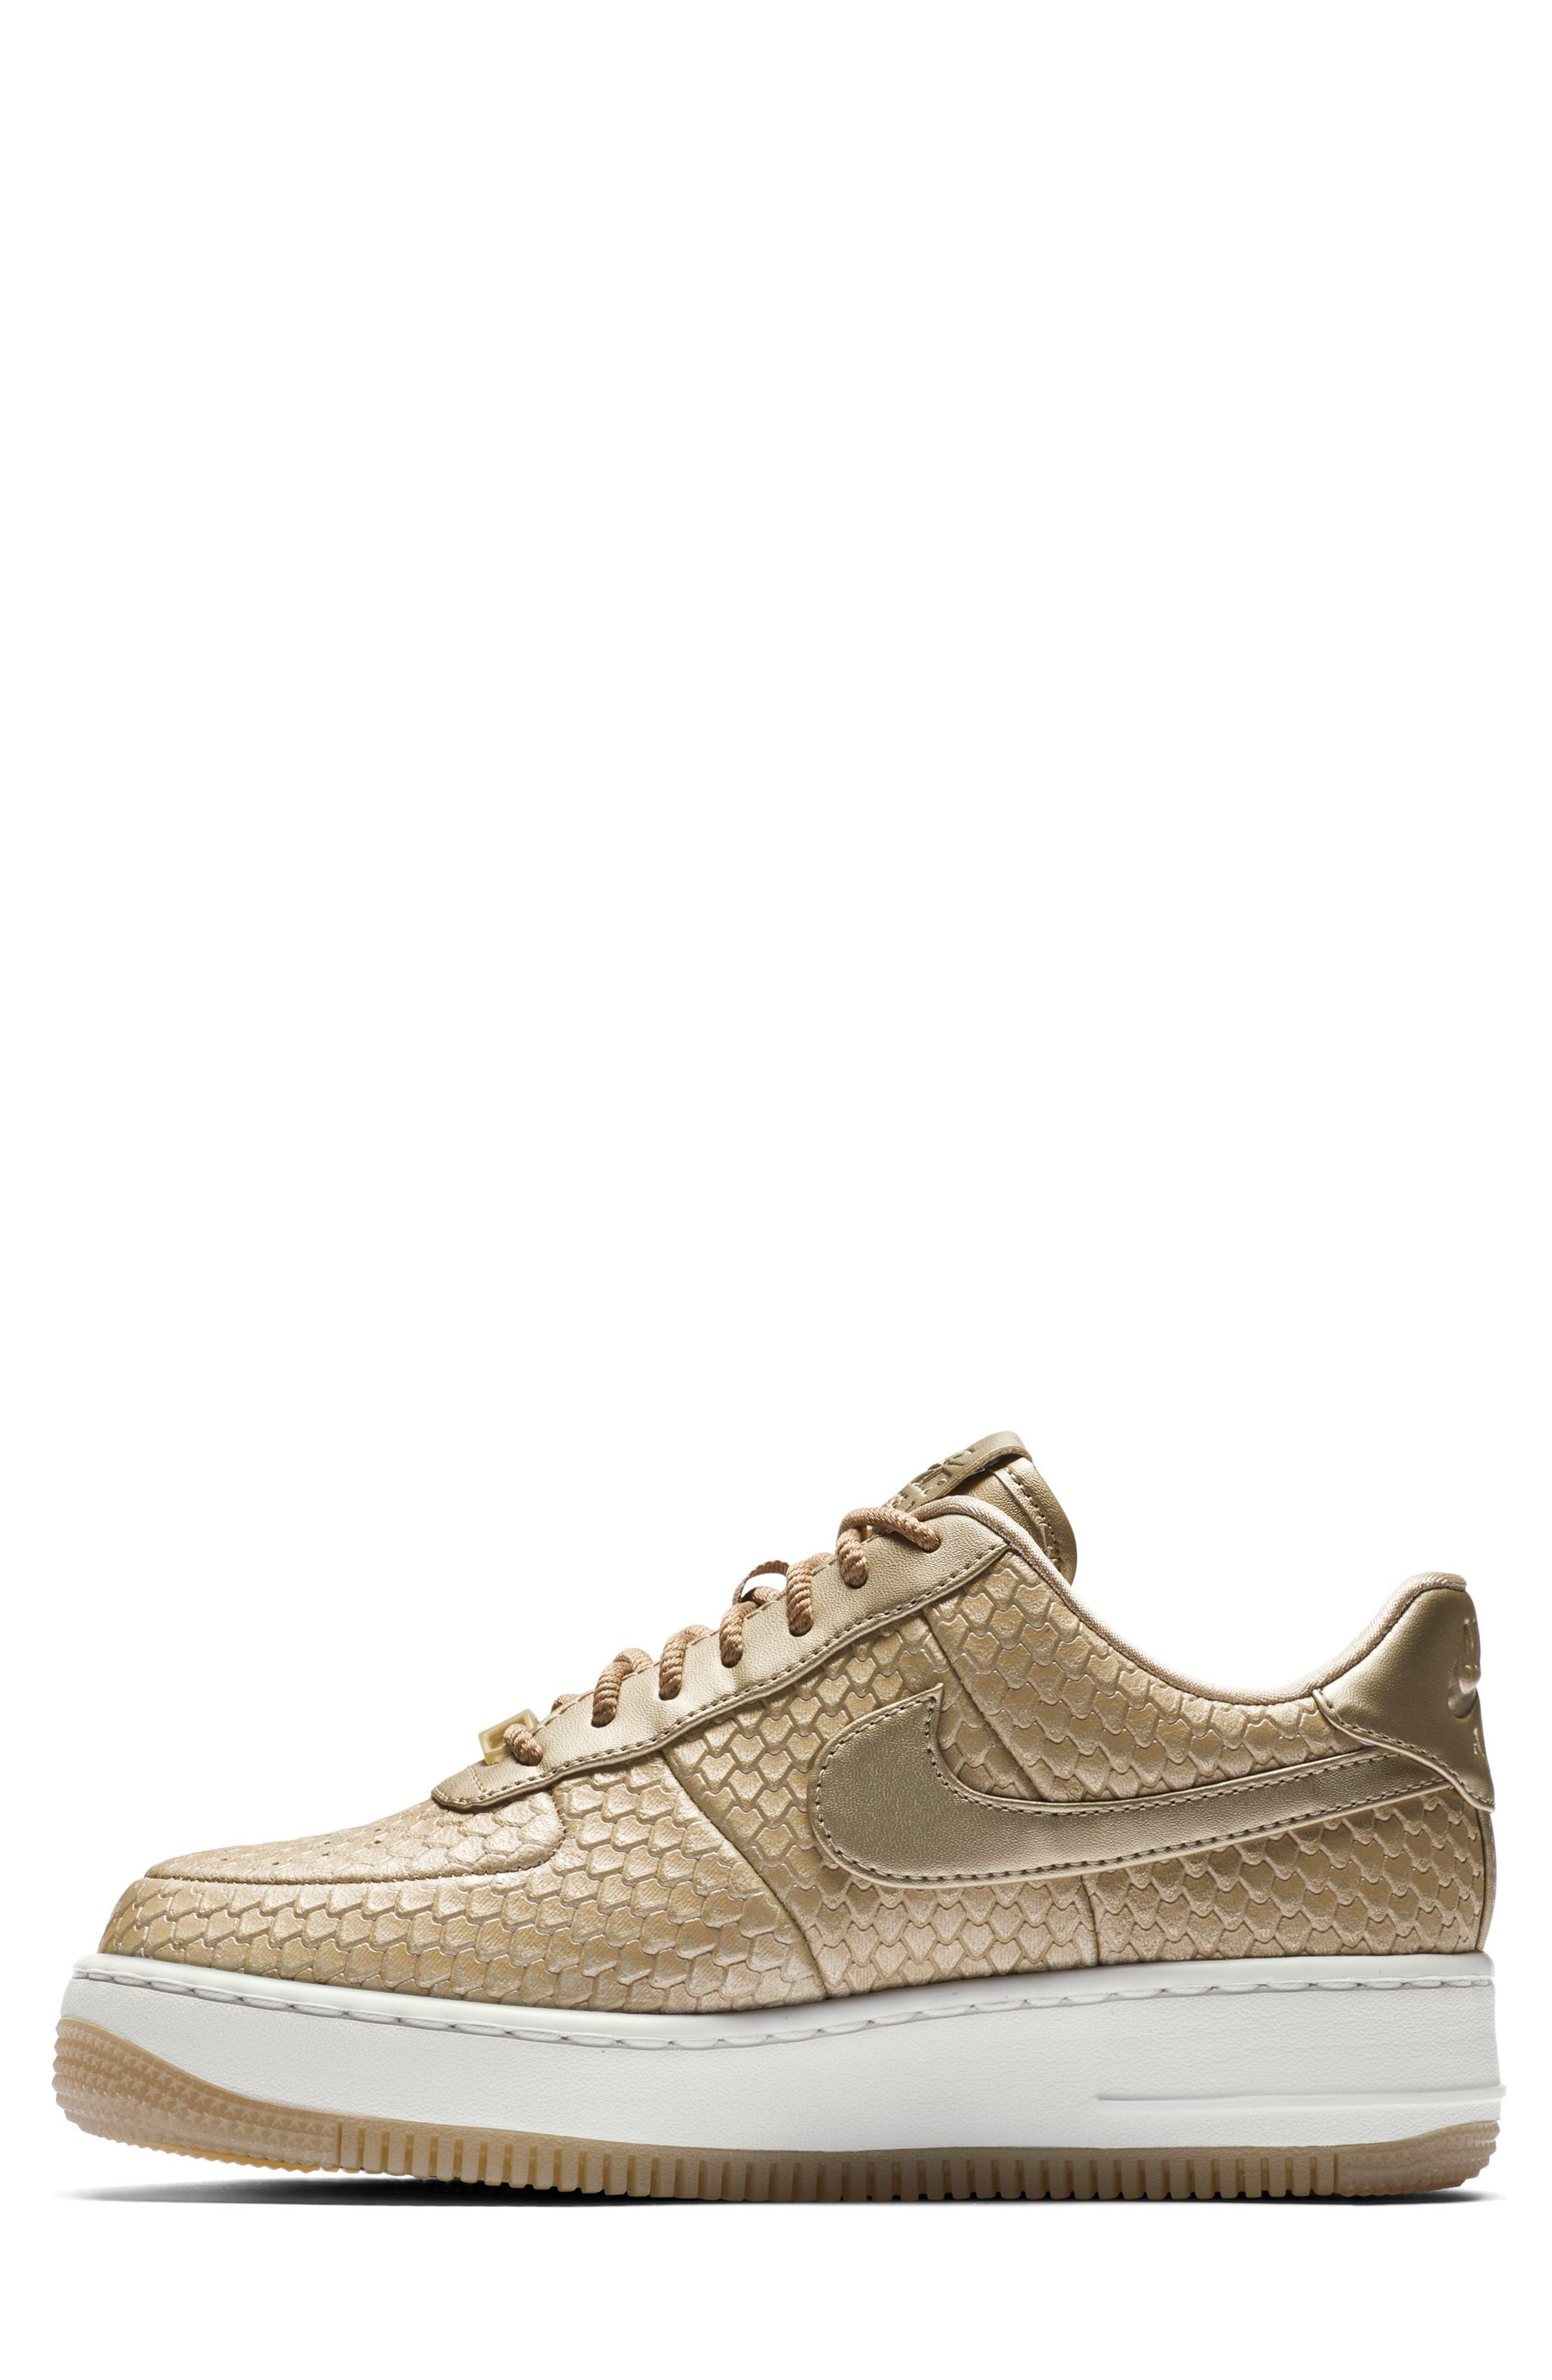 Air Force 1 Upstep Premium Platform Sneaker,                             Alternate thumbnail 2, color,                             Blur/ Blur/ Summit White